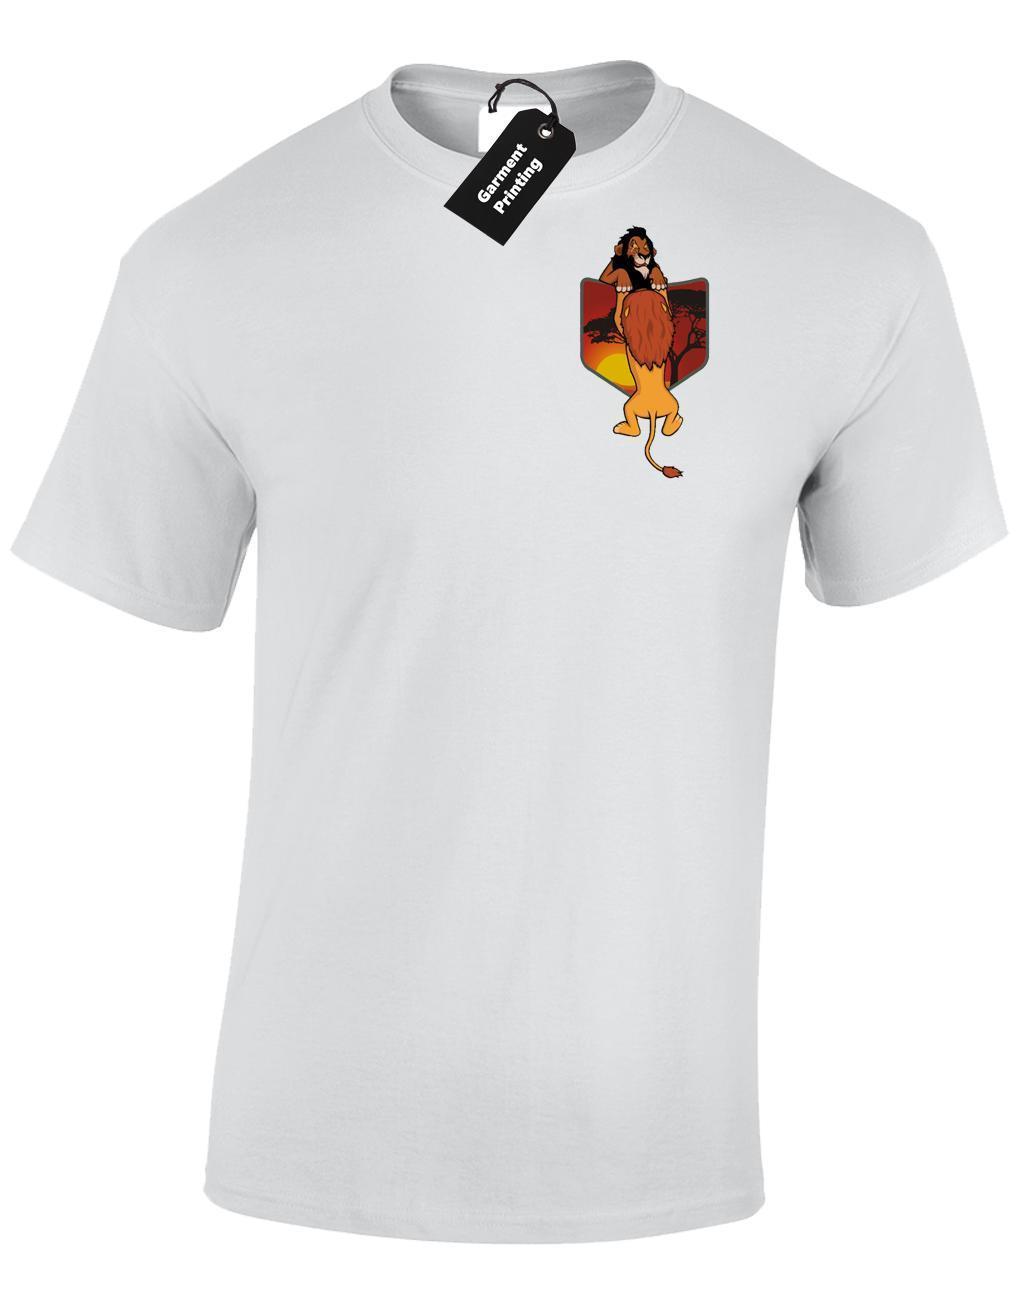 e3920389d1d4 MUFASA SCAR POCKET MENS T SHIRT FUNNY LION DESIGN KING RETRO CUTE TOP  COLOUR Online Buy T Shirts Tna Shirts From Linnan09, $14.67| DHgate.Com